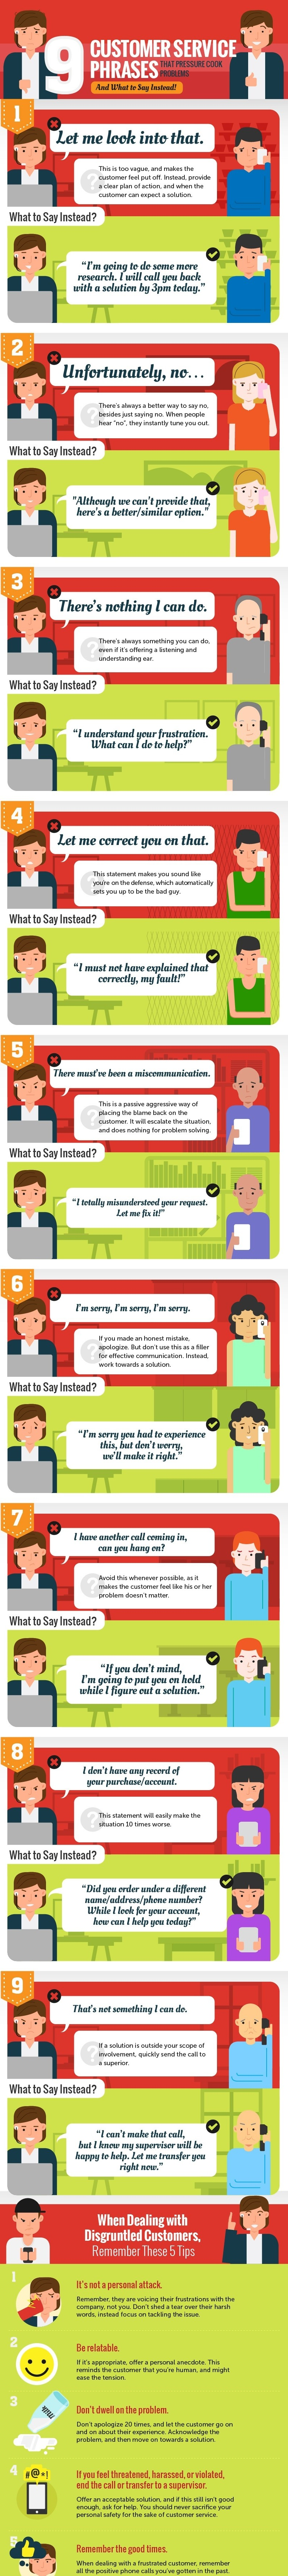 customer_service_phrases_to_avoid-1